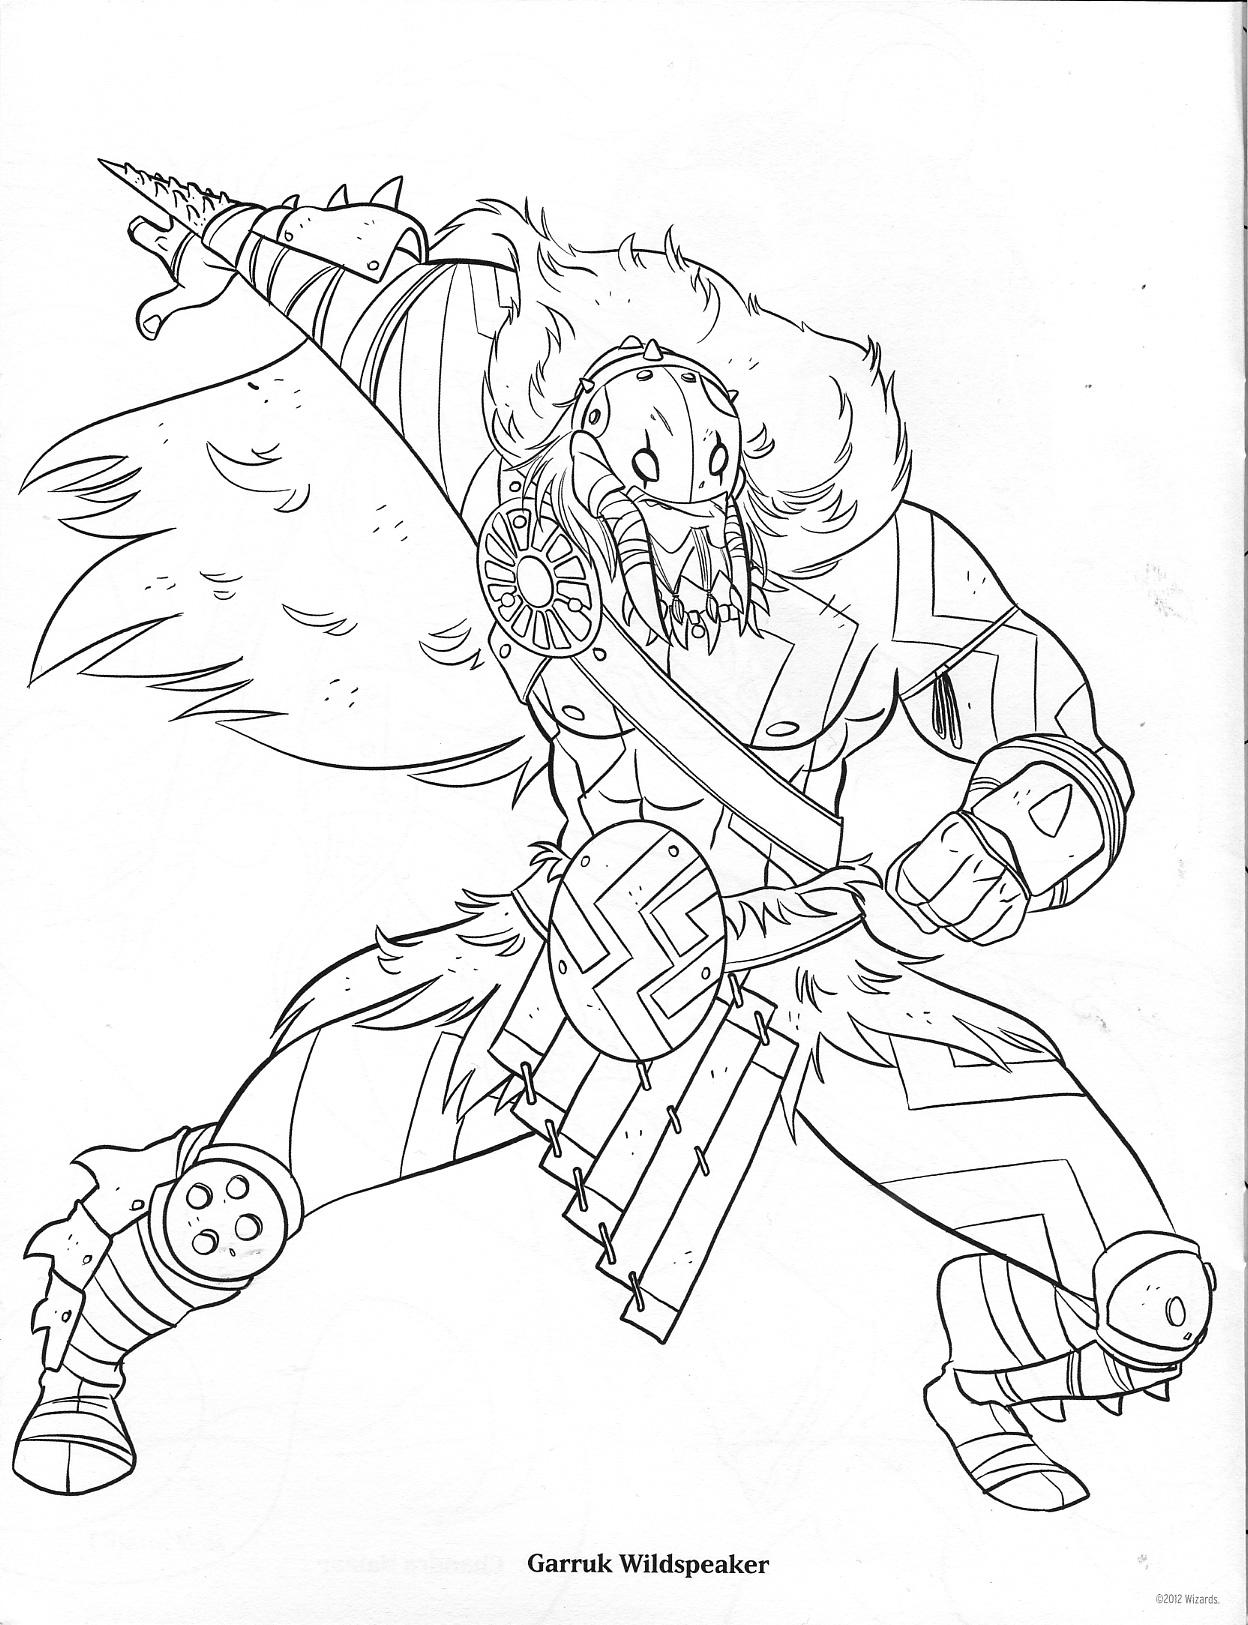 Ravnica (MTG) coloring #2, Download drawings